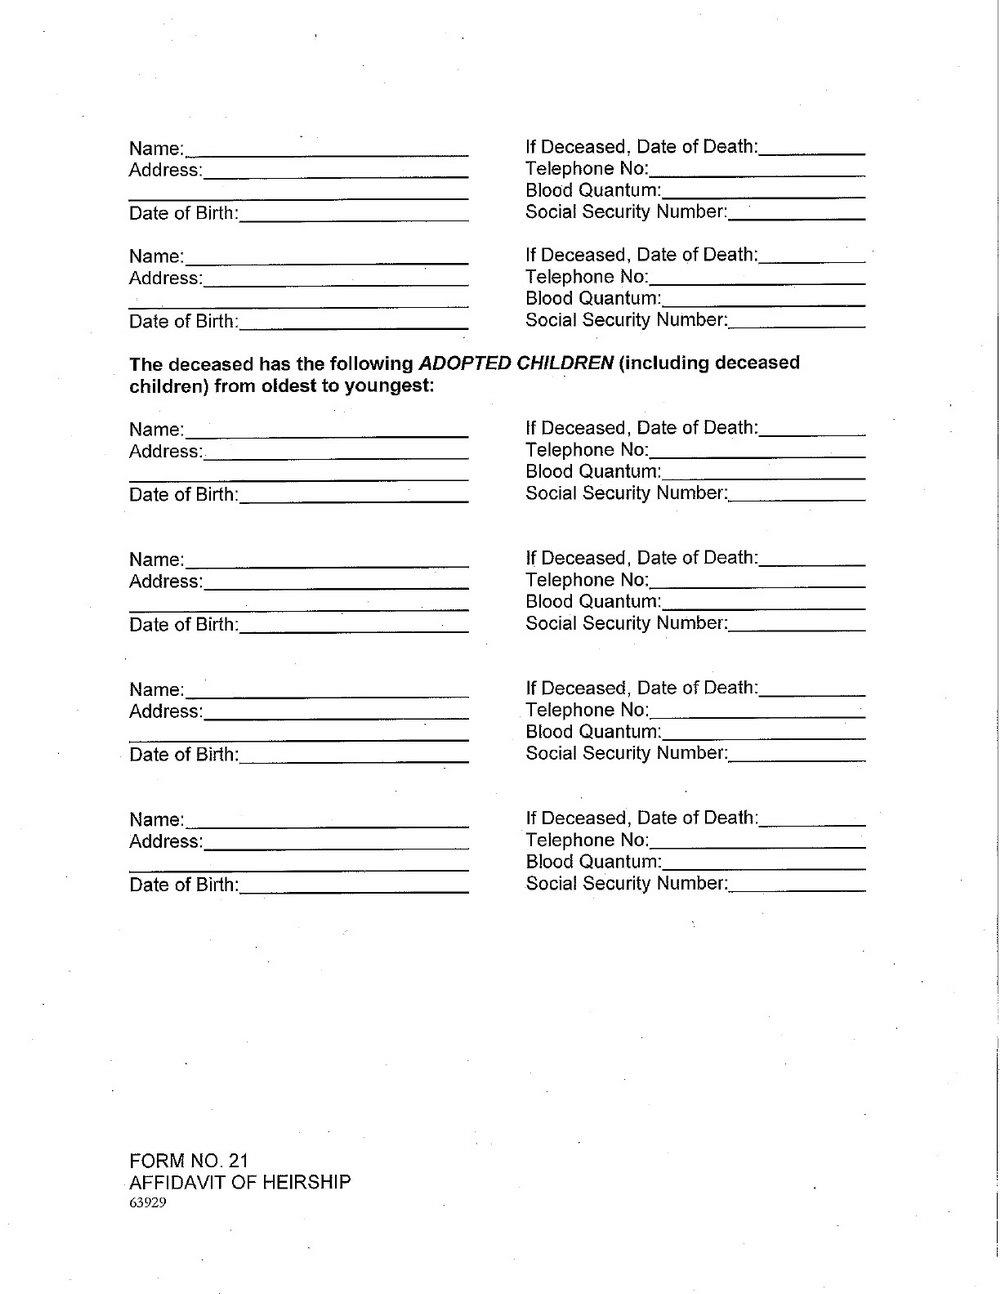 Affidavit Of Heirship Form Tennessee